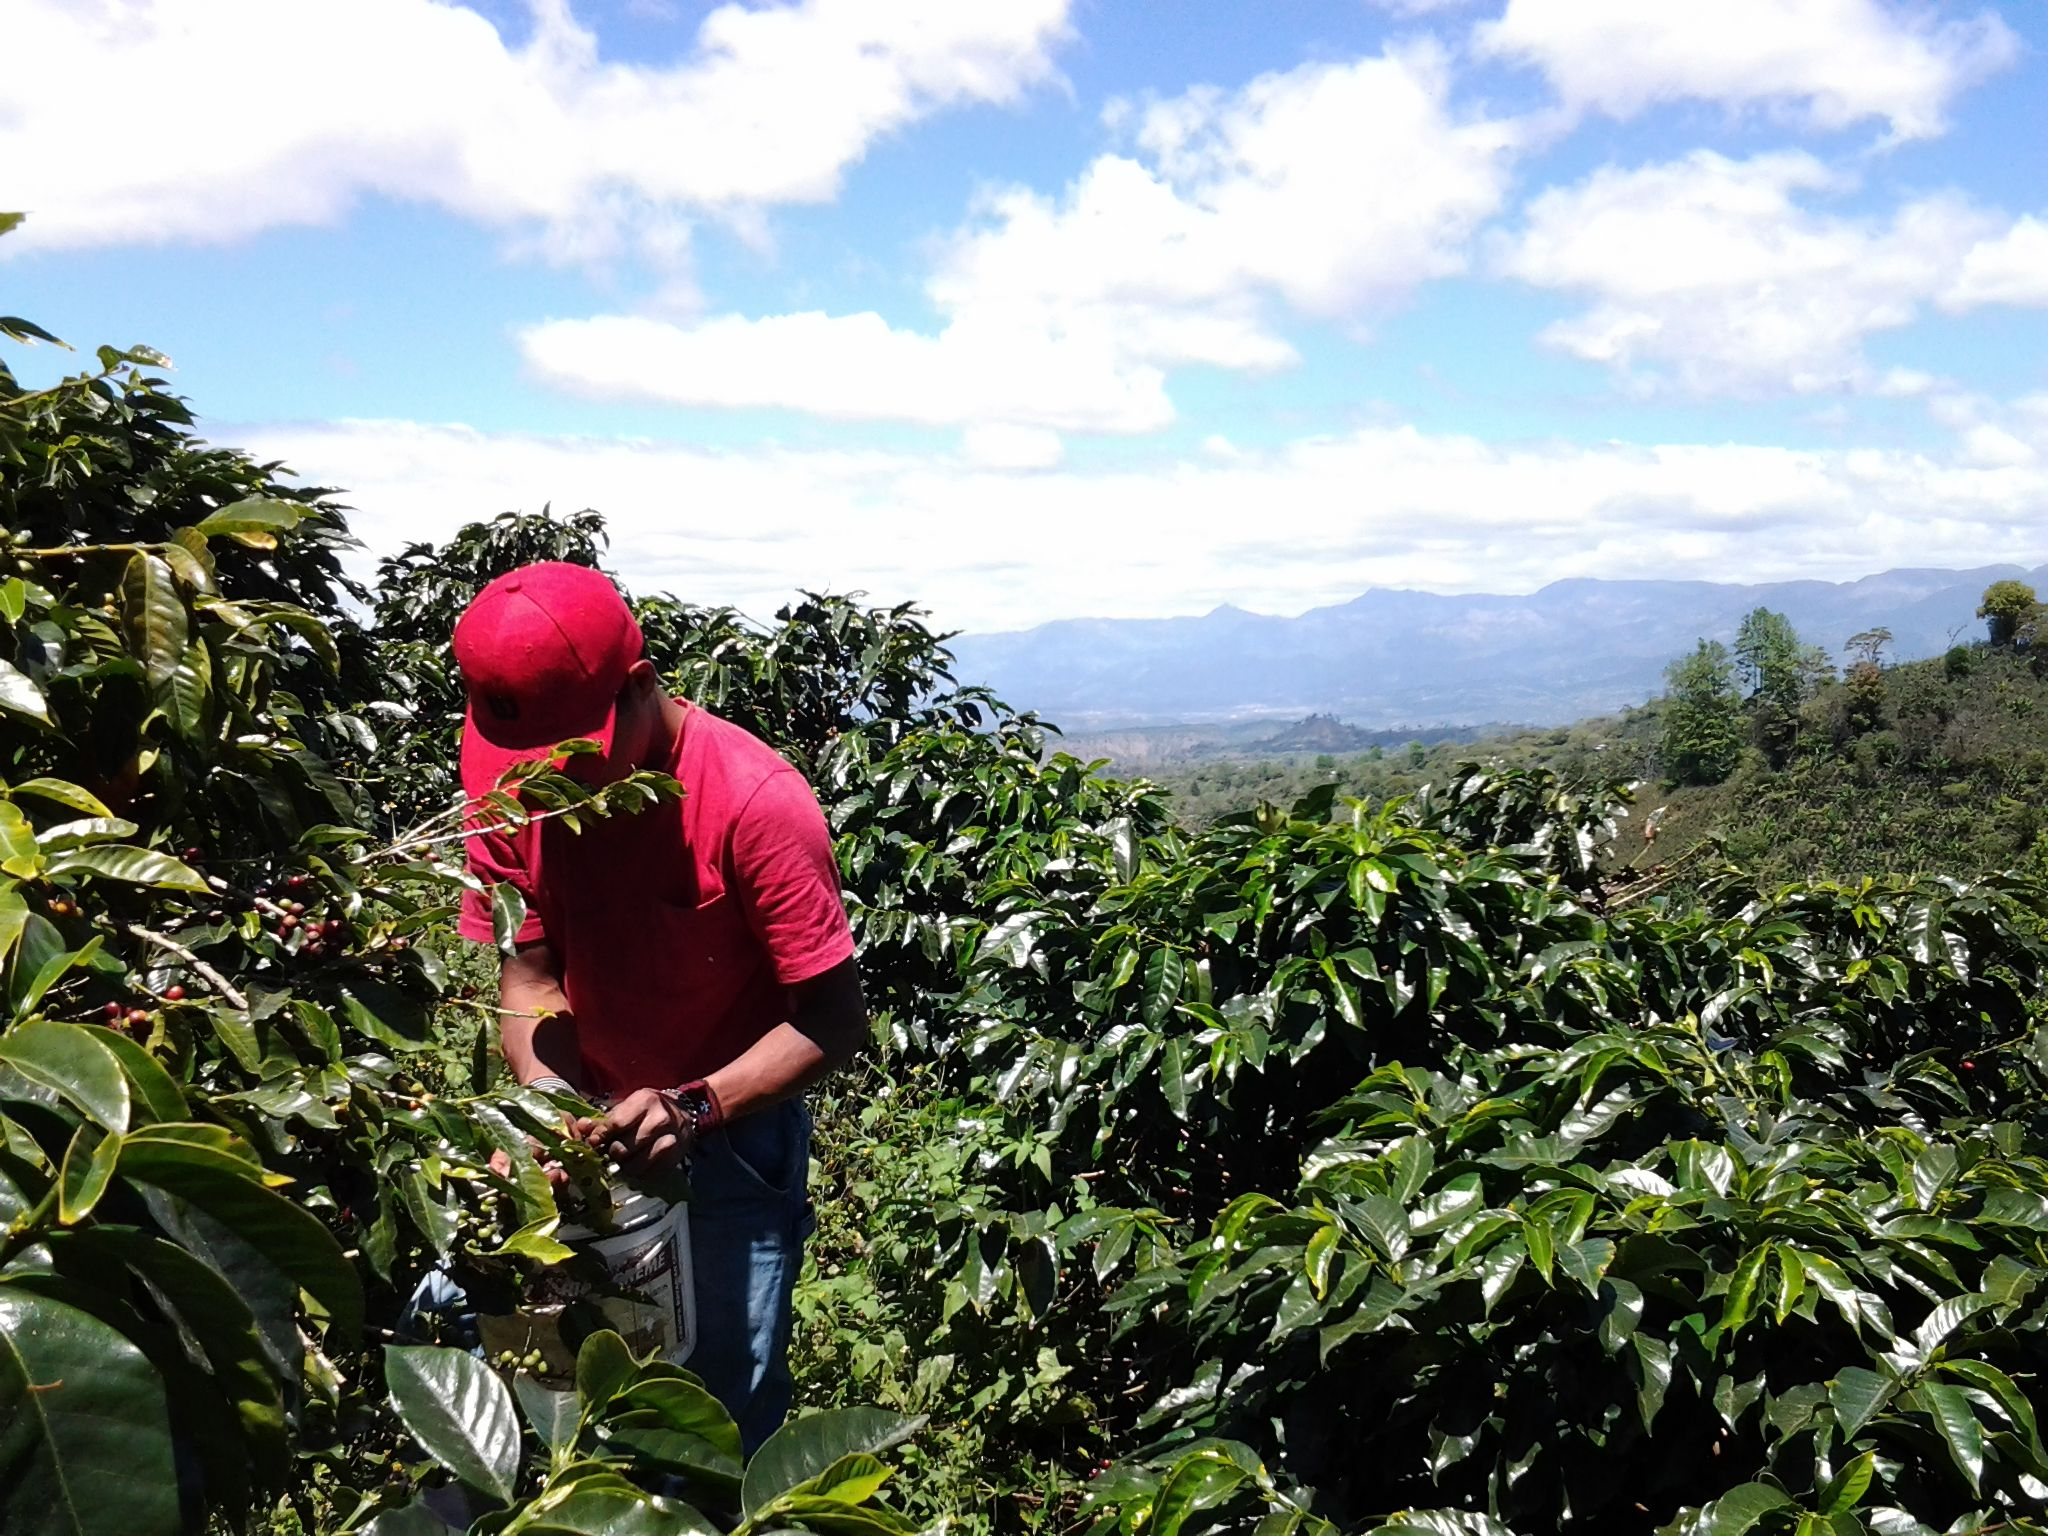 Picking coffee cherries at Finca Cerro Bueno in La Paz, Honduras.   www.hondurascoffeefamily.com